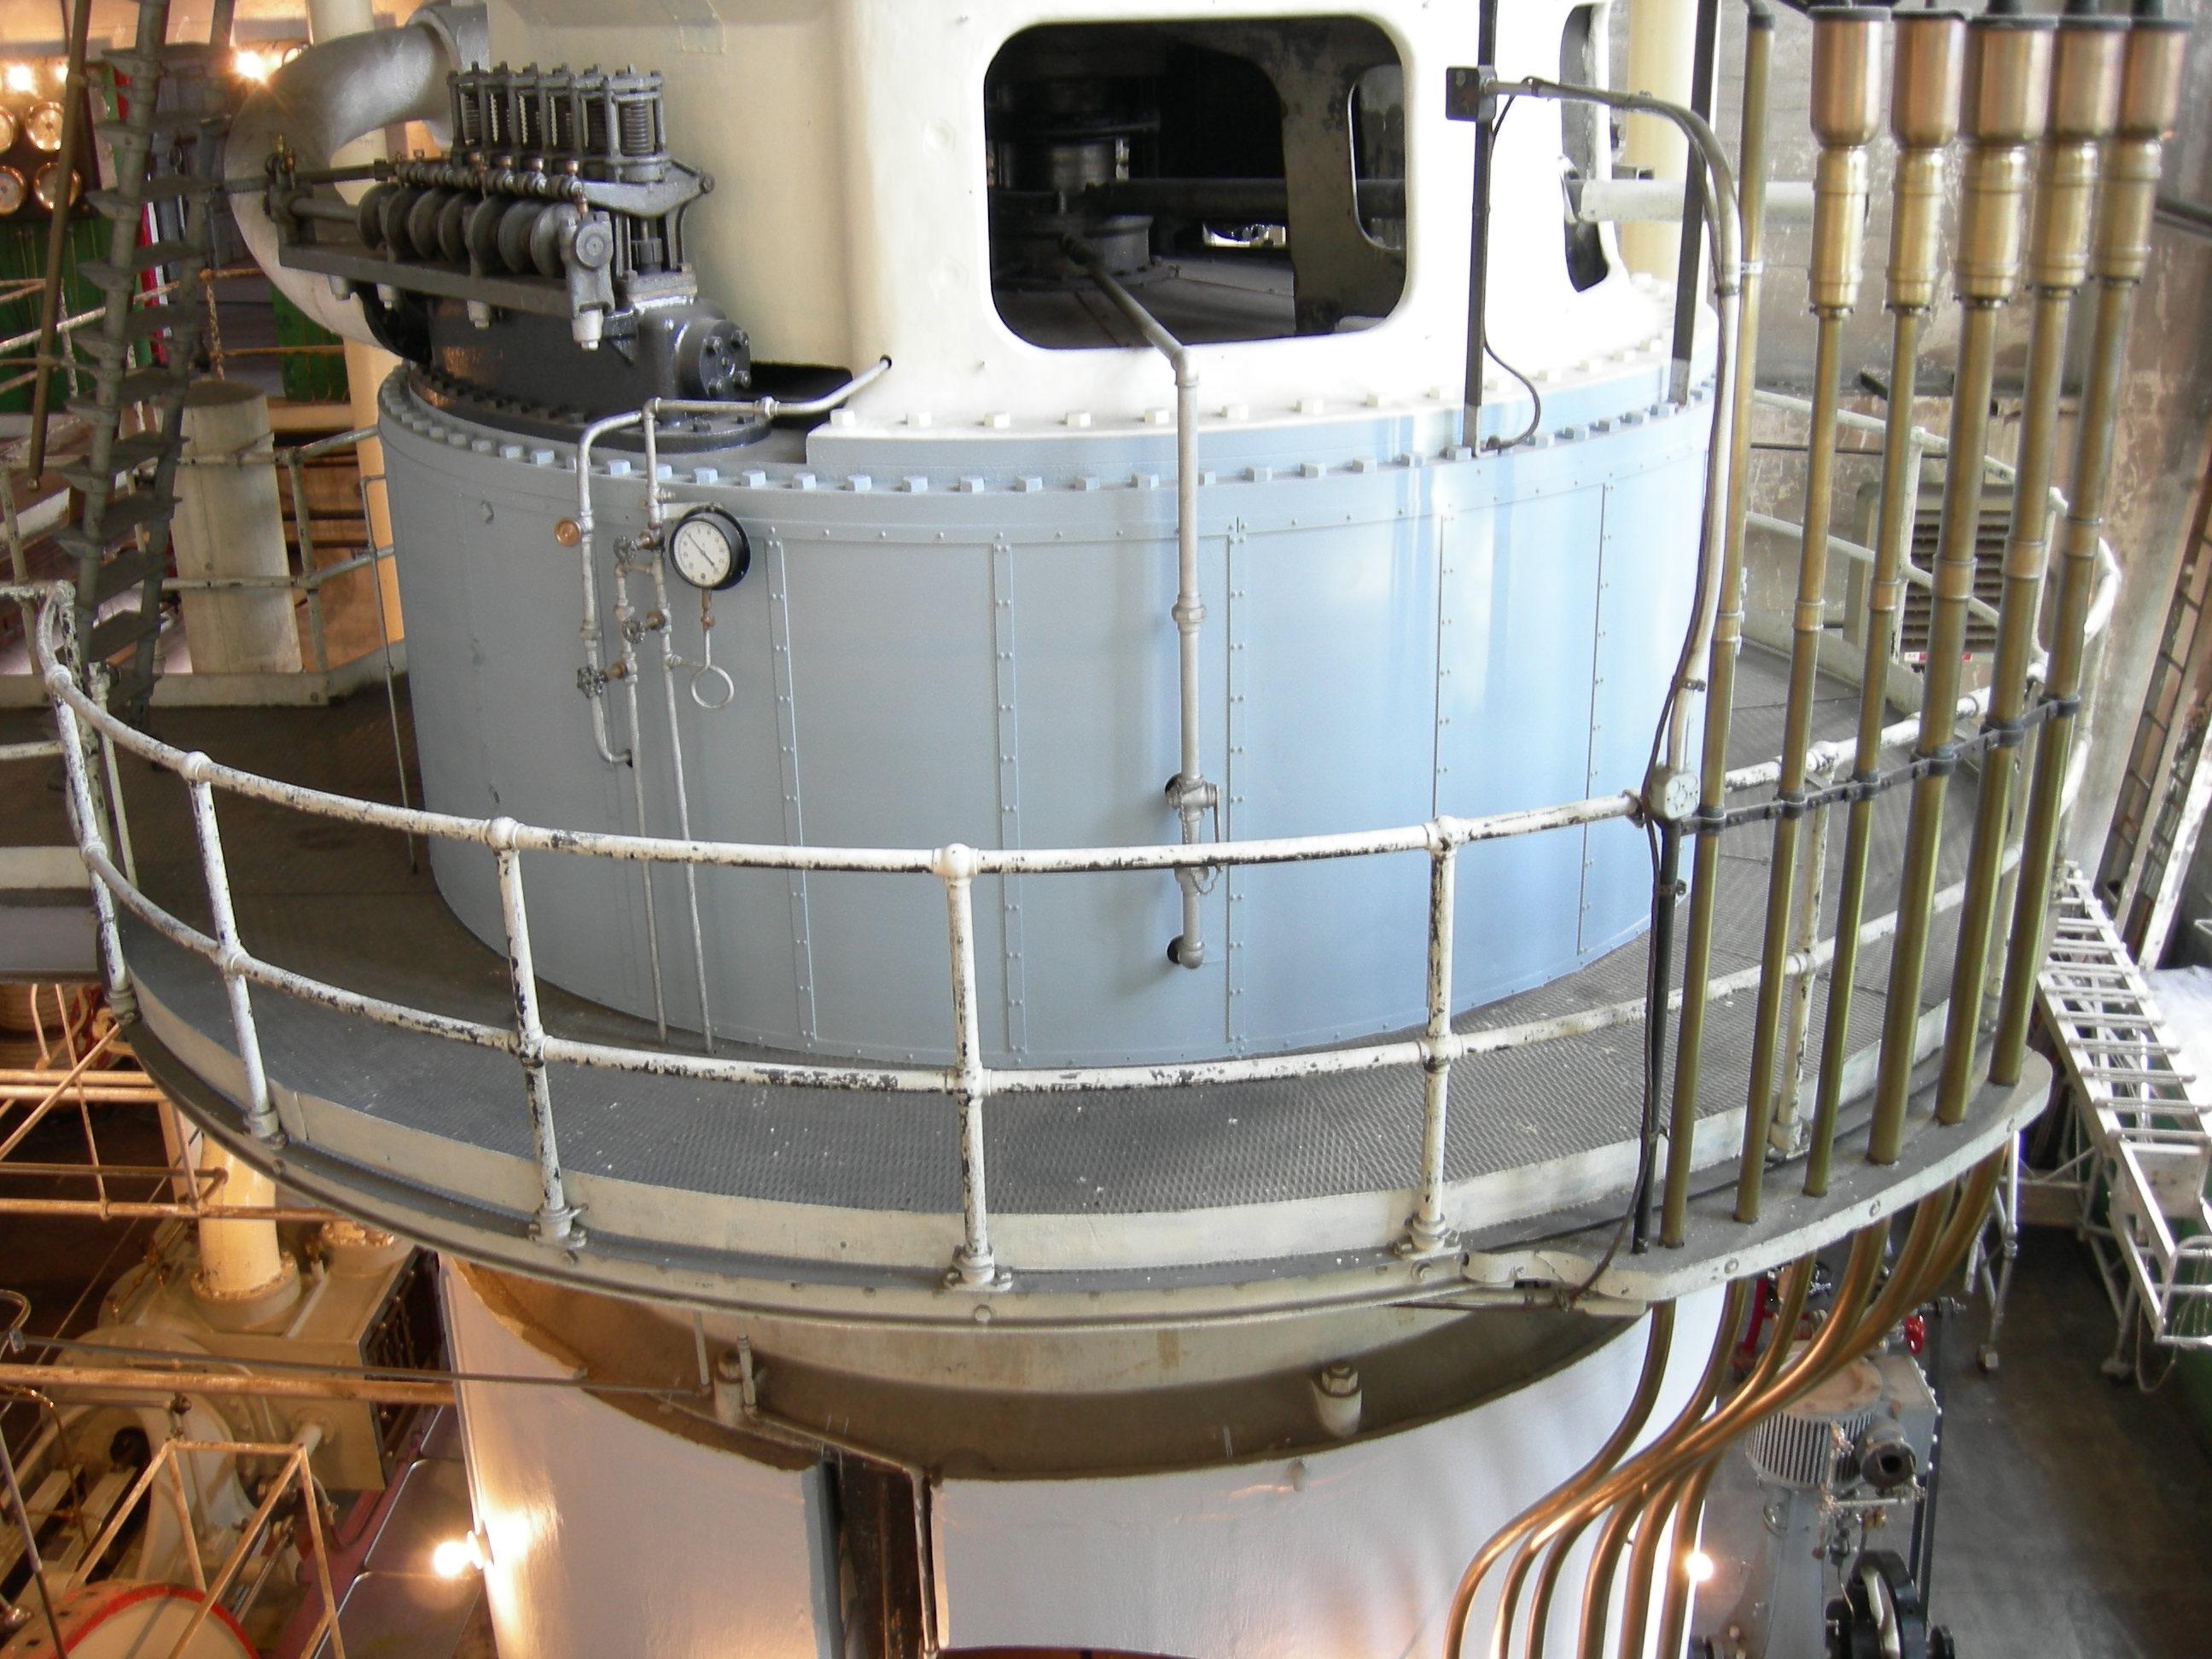 File:Georgetown PowerPlant Museum boiler pan 3.jpg - Wikimedia Commons